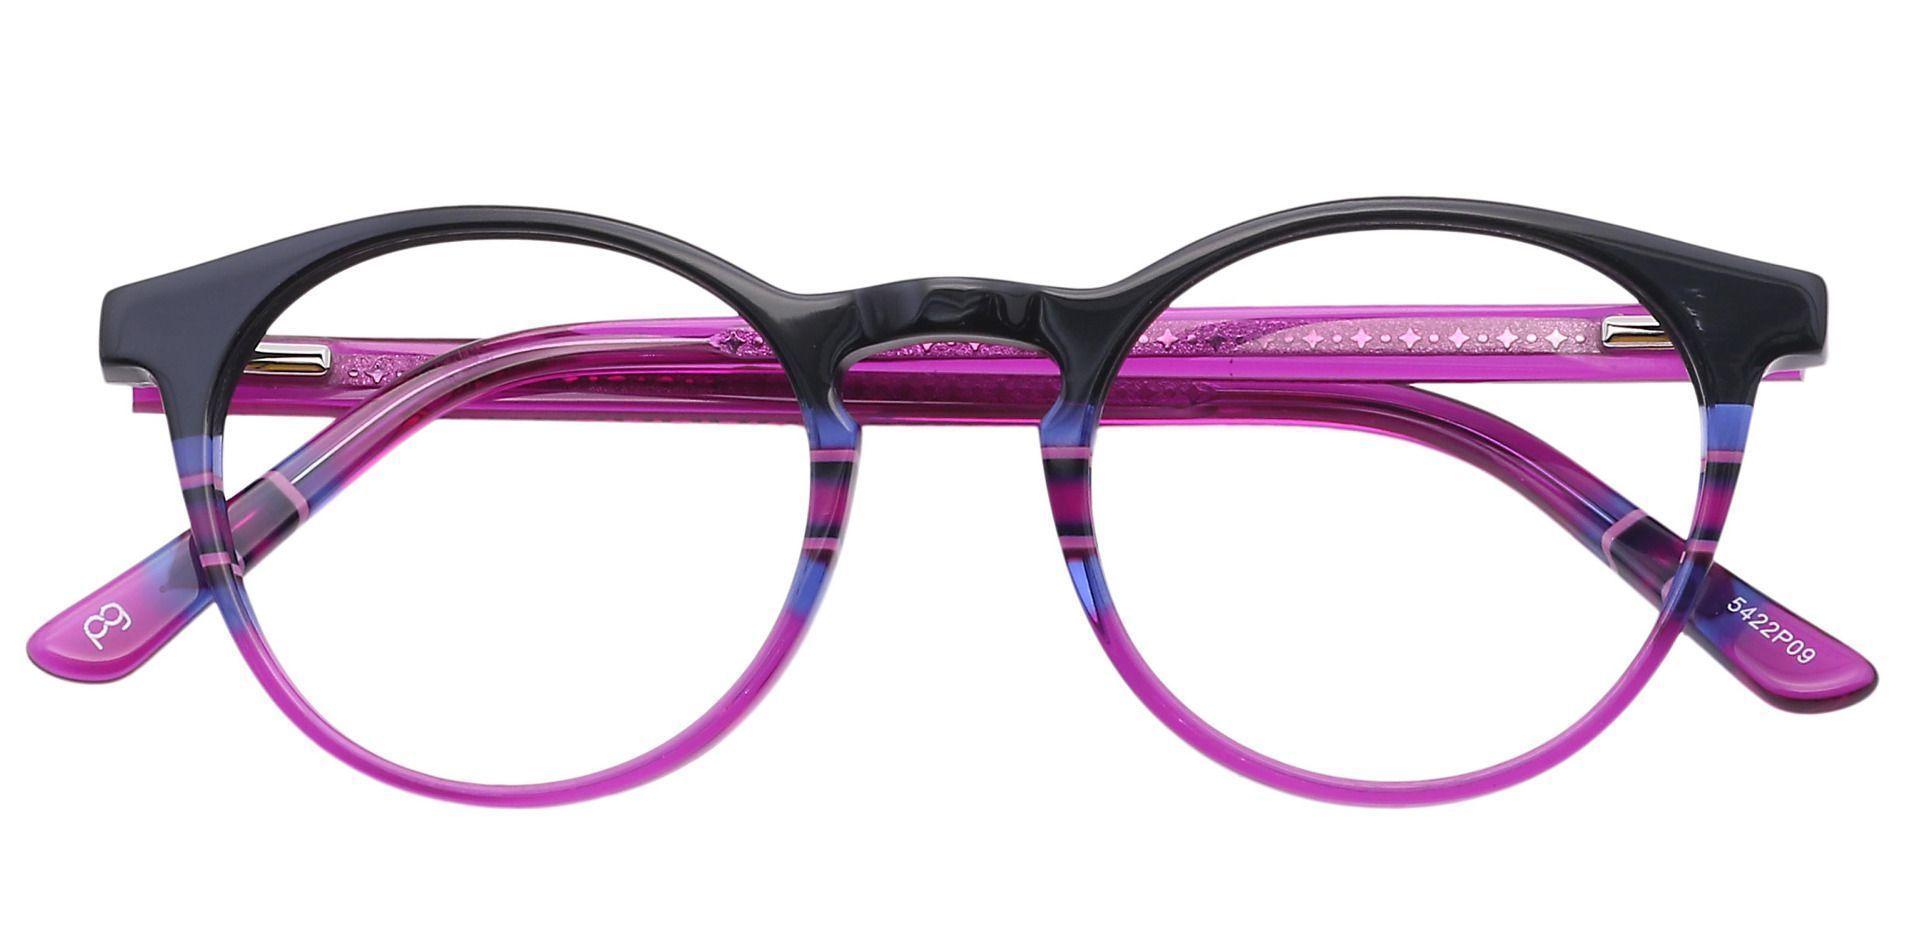 Jellie Round Lined Bifocal Glasses - Black/blue Fuschia Stripe  Purple